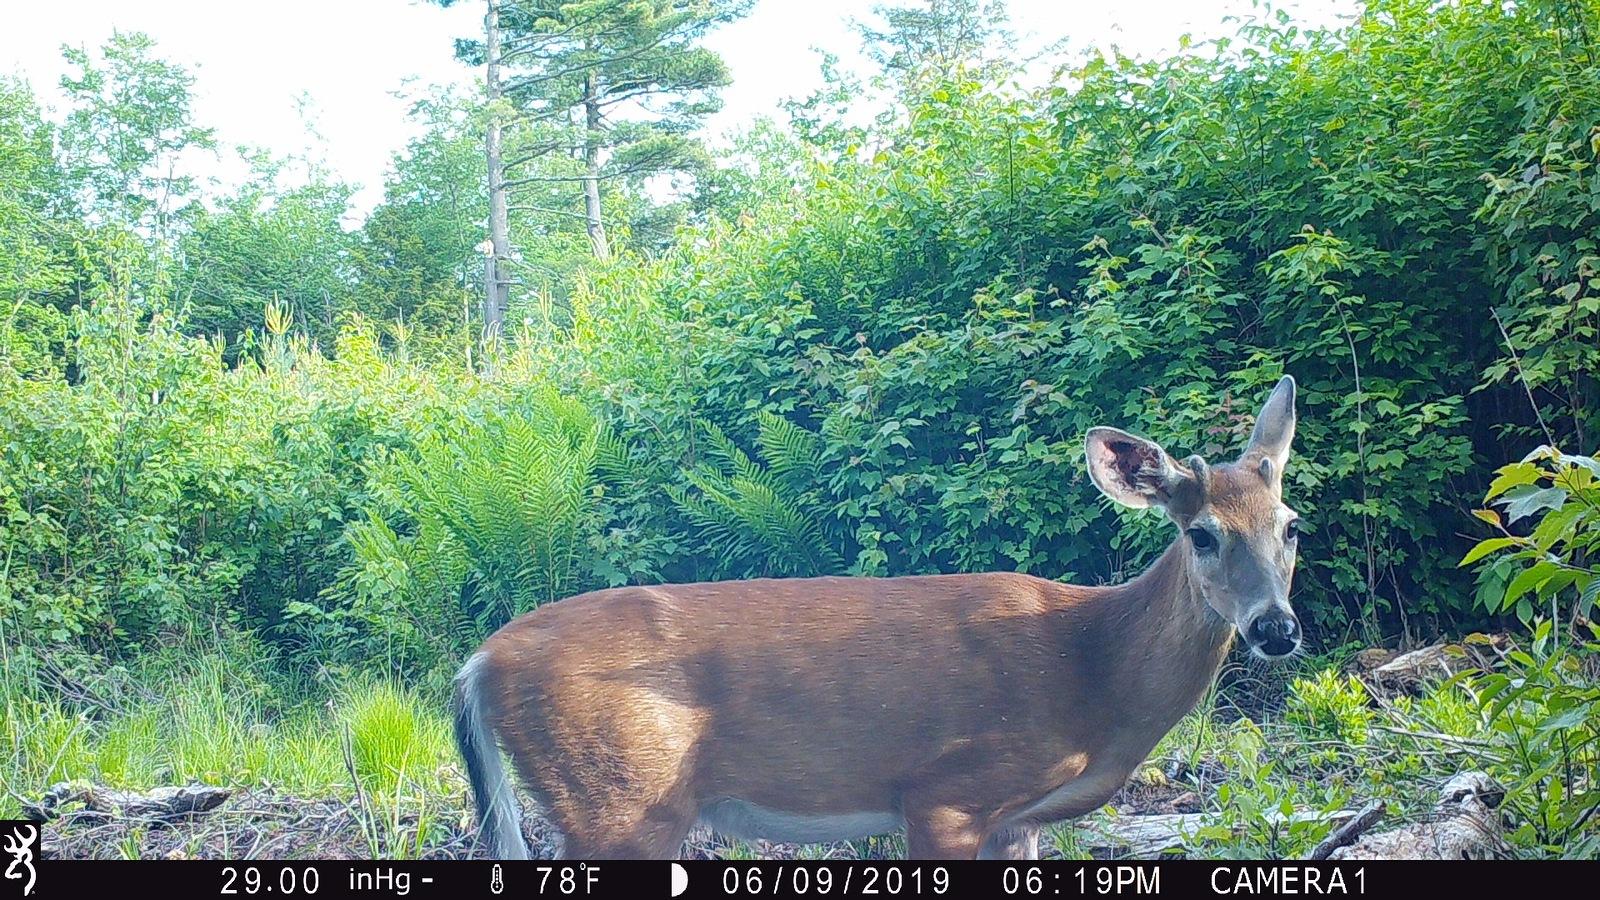 deer1.jpg.51ef6112d07815eba765b241ae6d8053.jpg